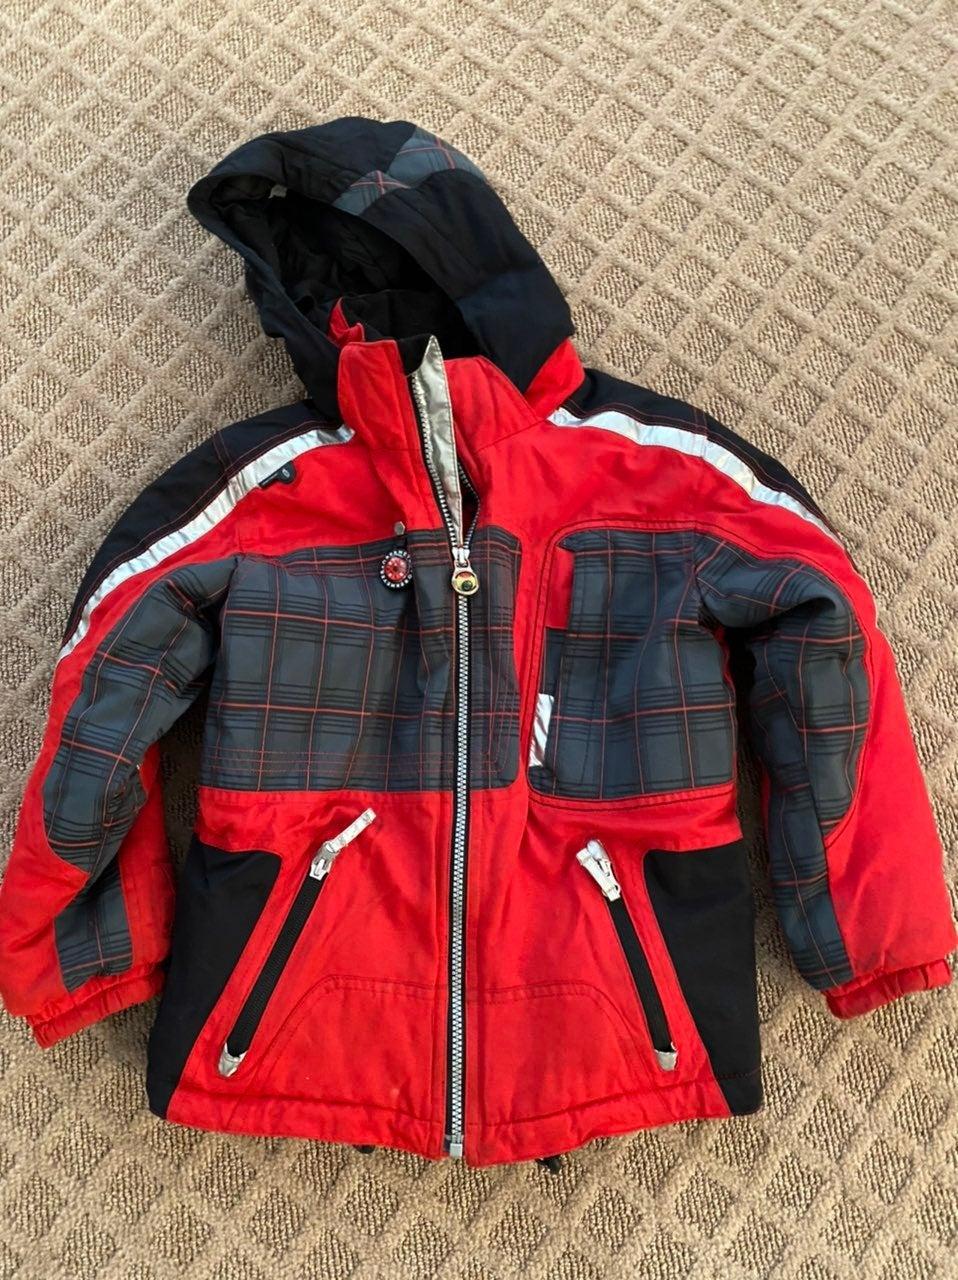 Obermeyer ski winter Jacket 6 coat